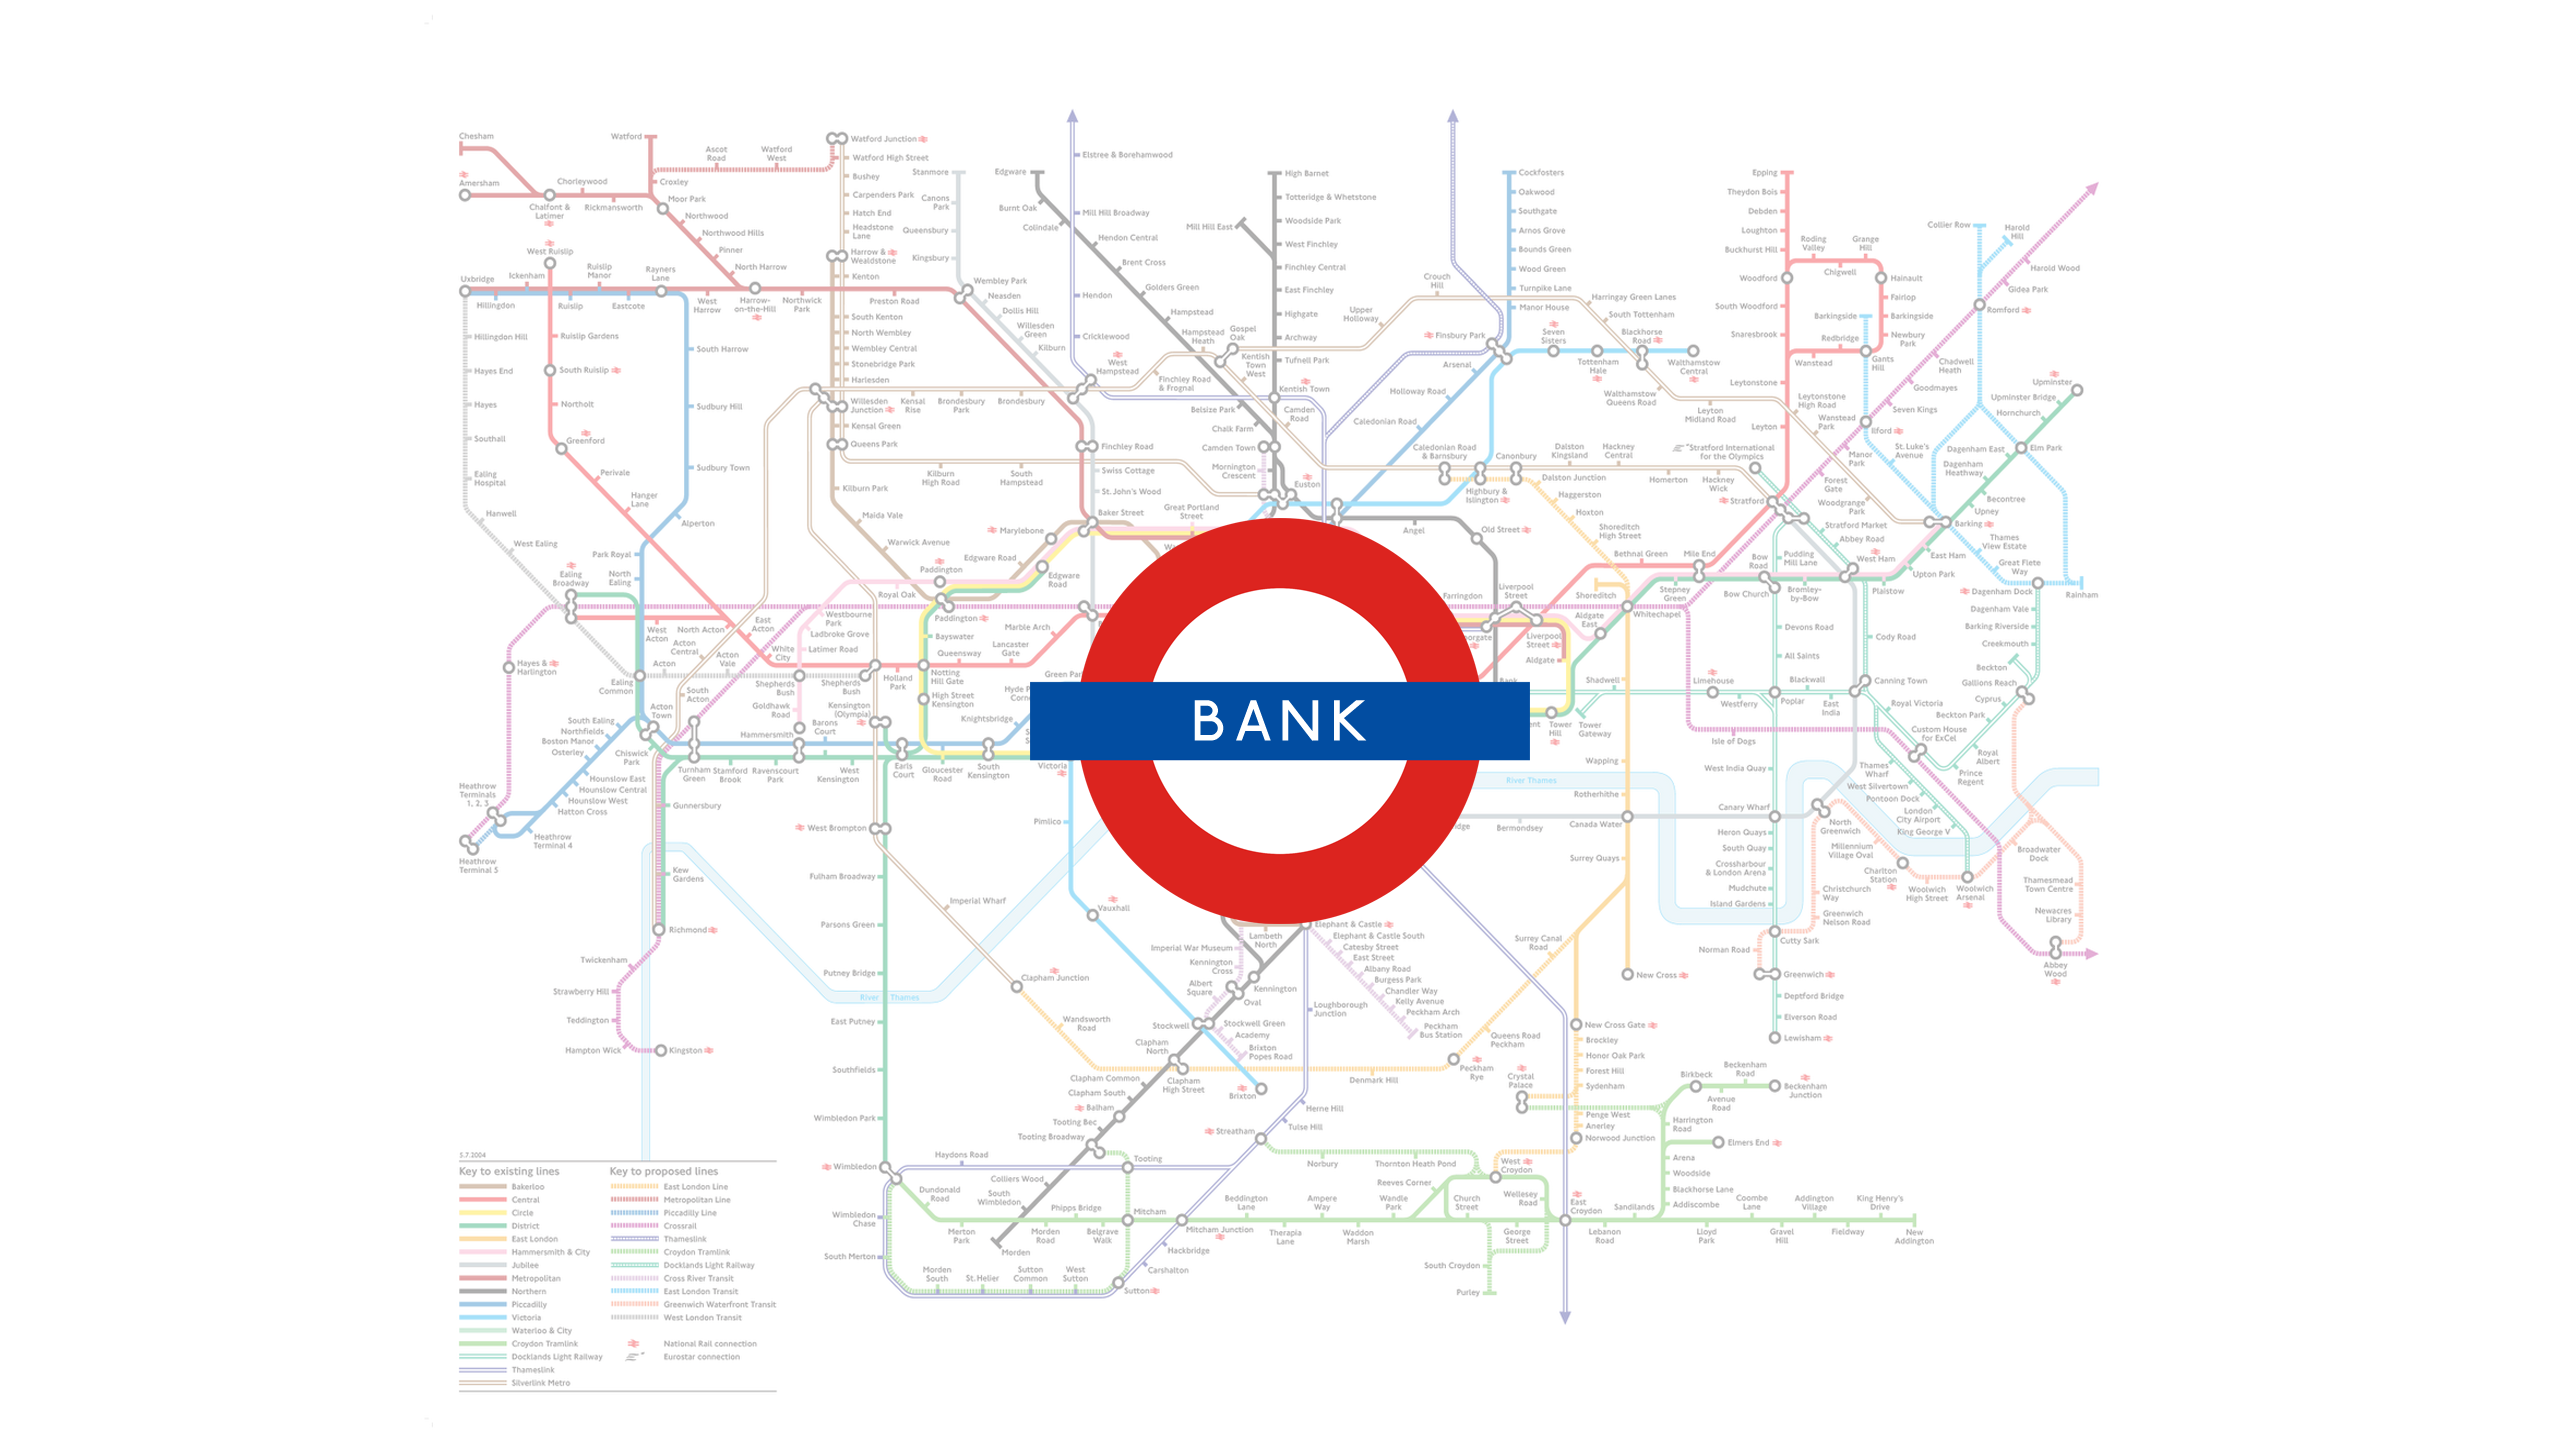 Bank (Map)